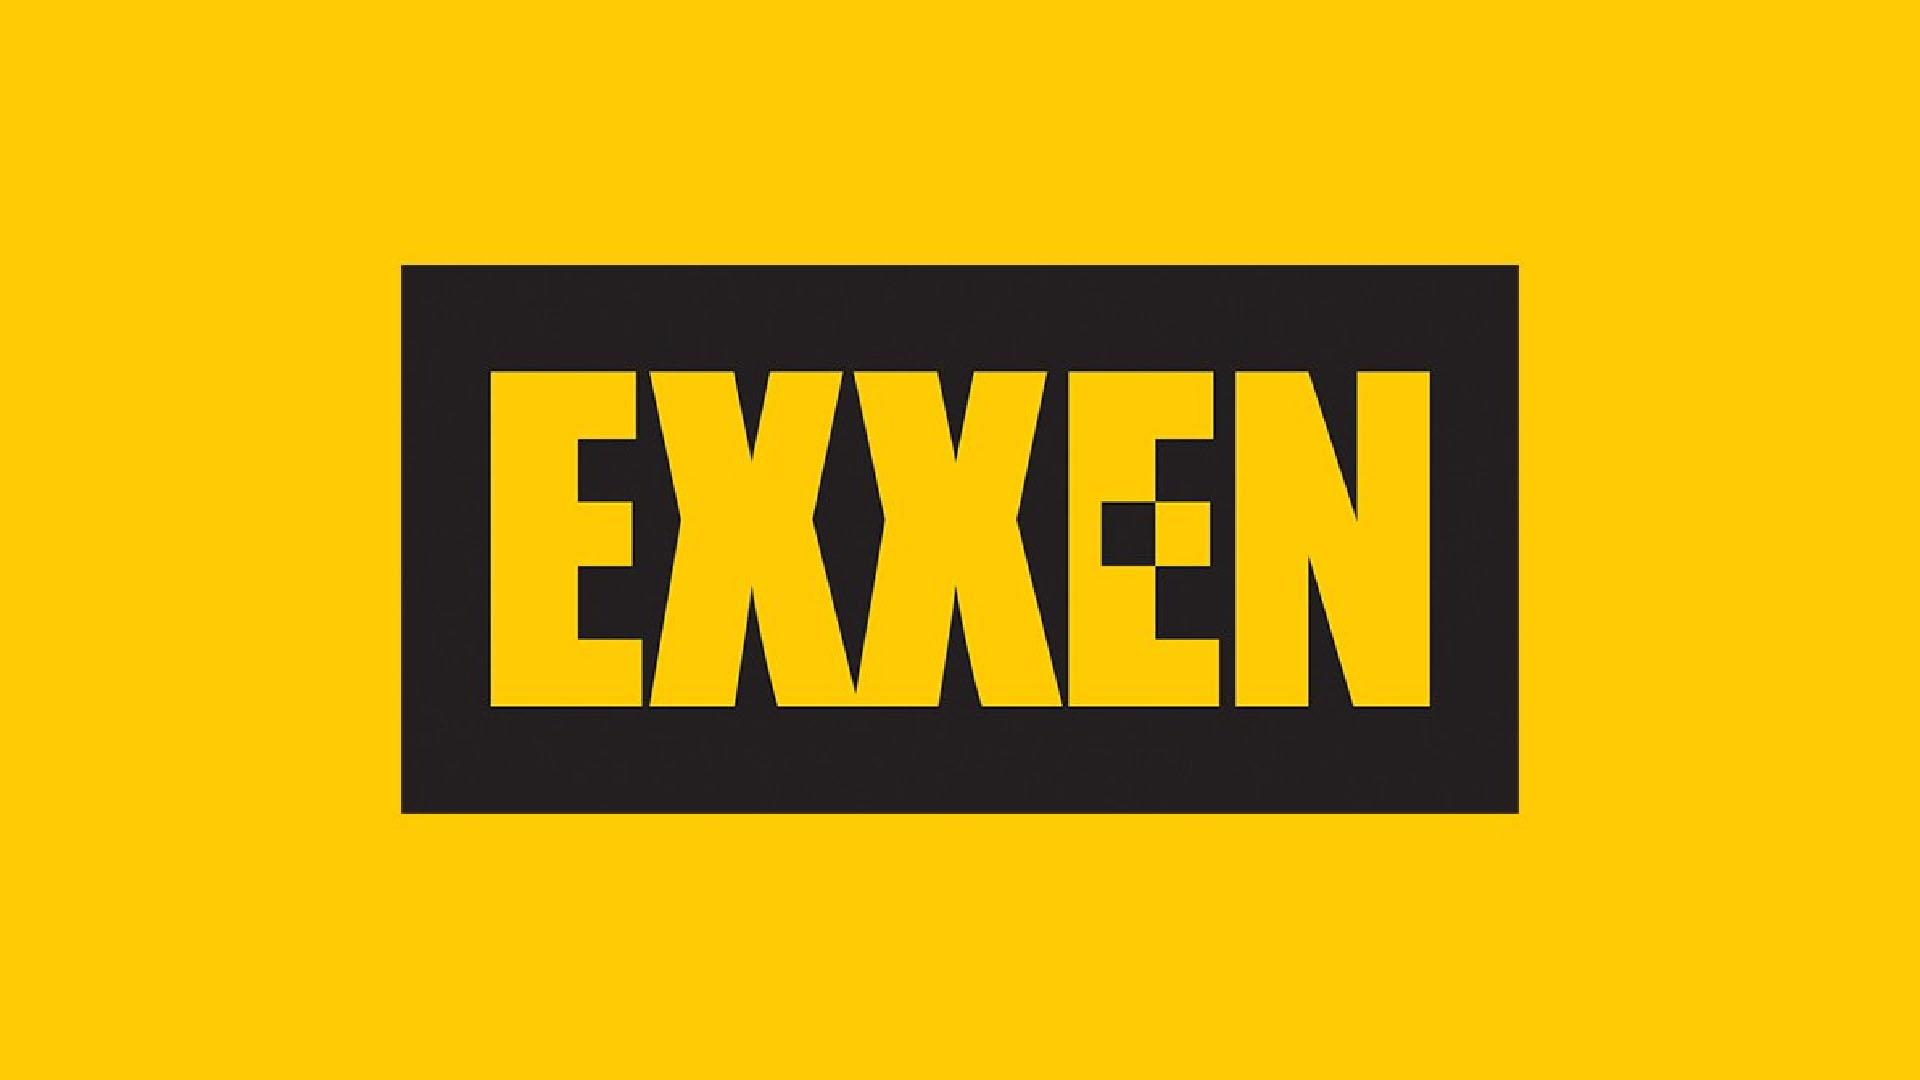 exxen üyelik exxen fiyat exxen dizileri exxen ücreti exxen abonelik exxen aylık ücret exxen bedava izle exxen bedava exxen bedava izleme